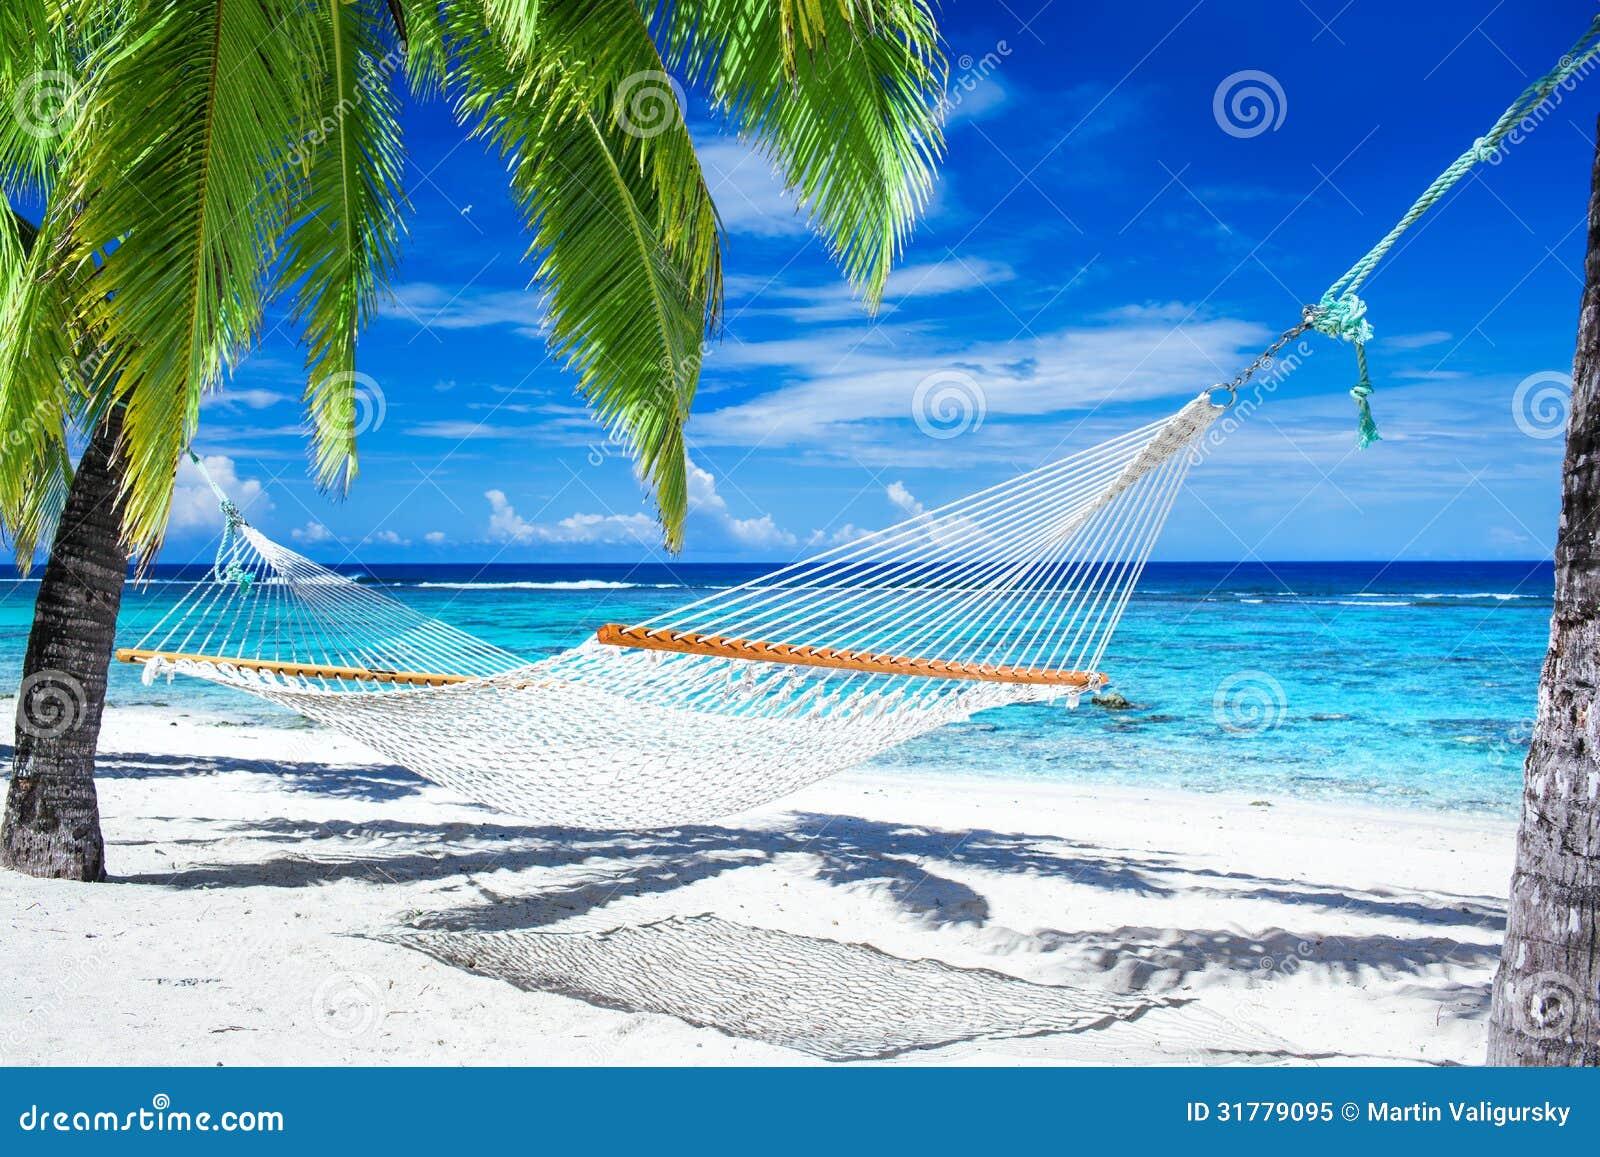 hammock between palm trees on tropical beach royalty free